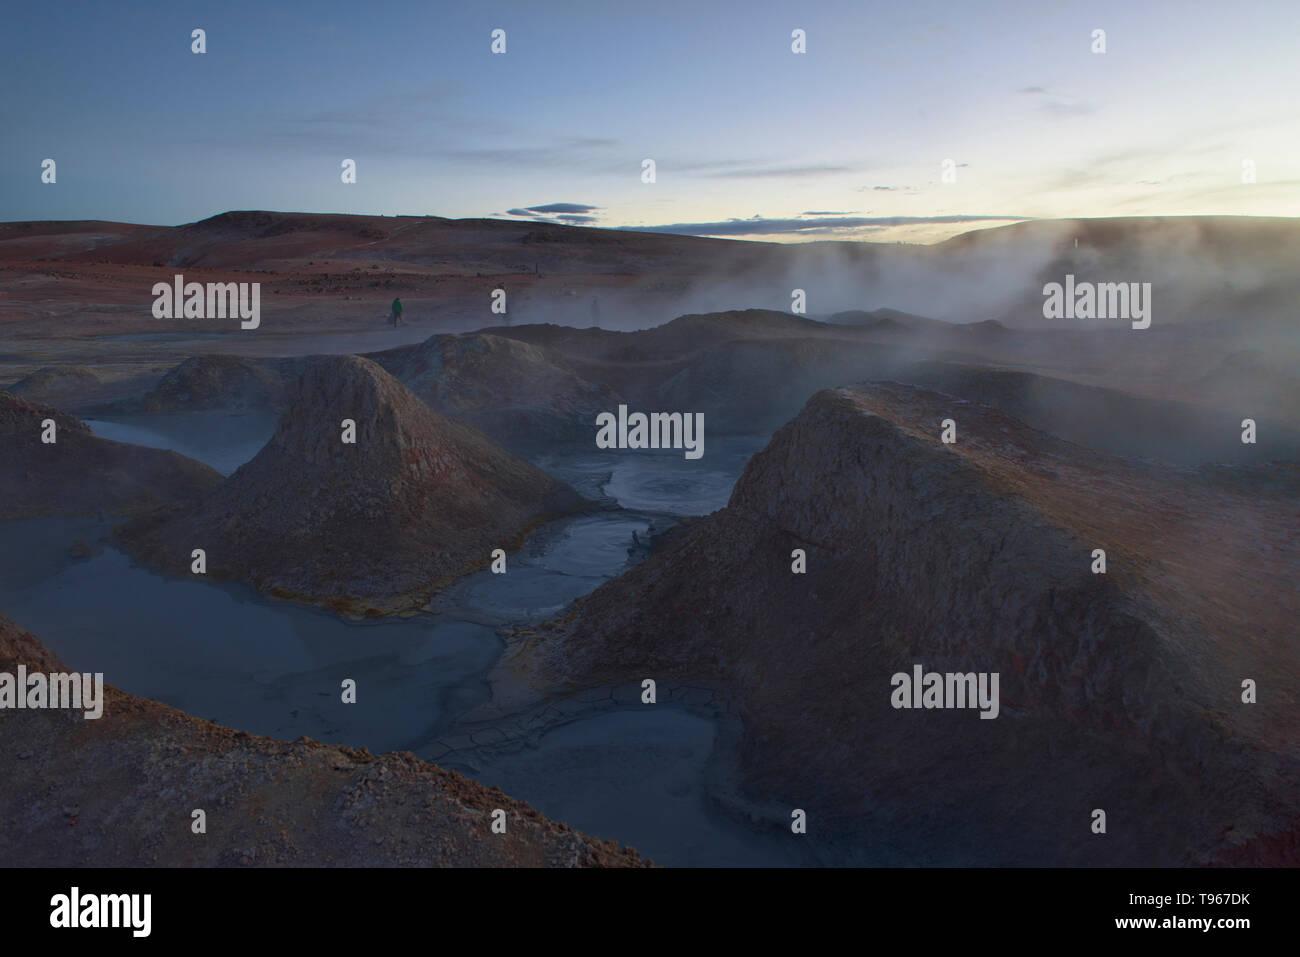 Sol de Mañana geysers steaming at dawn, Salar de Uyuni, Bolivia - Stock Image